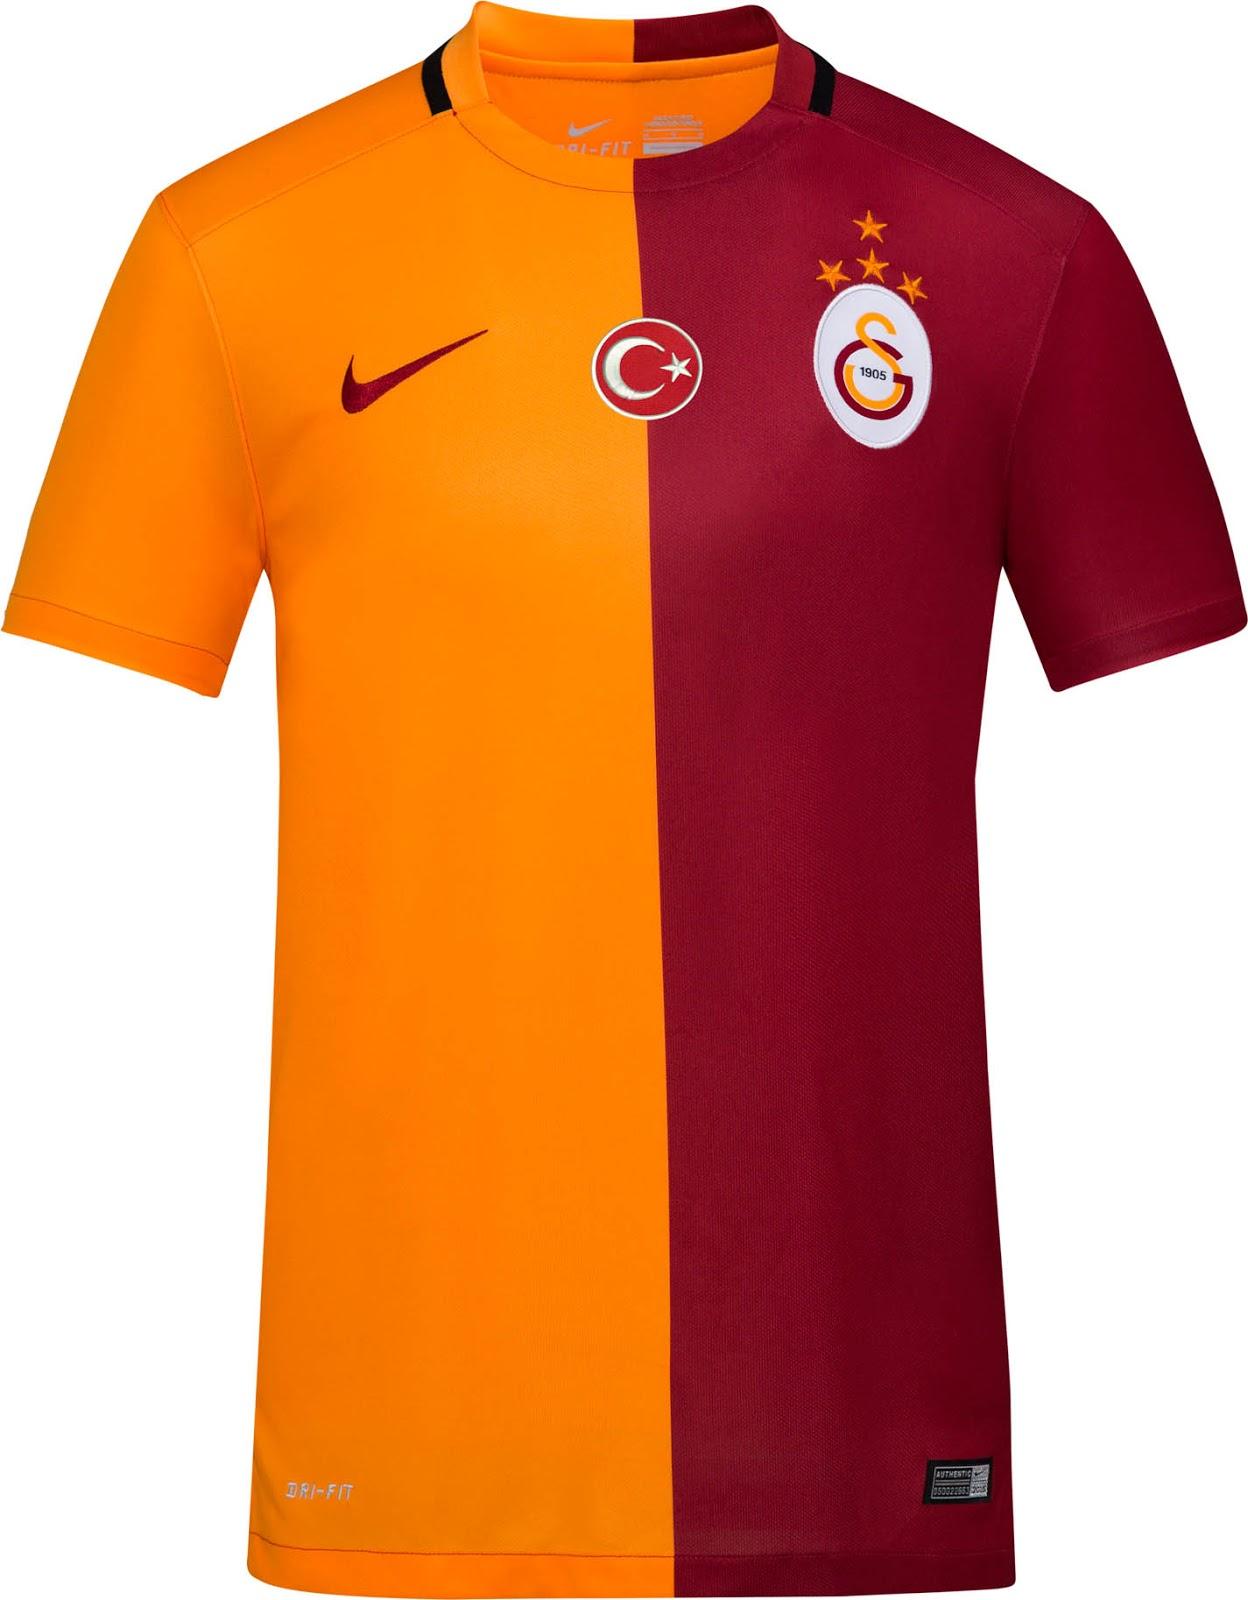 best service d8796 e5fdf Tukish League Galatasaray 15-16 Home, Away and Third Kits ...